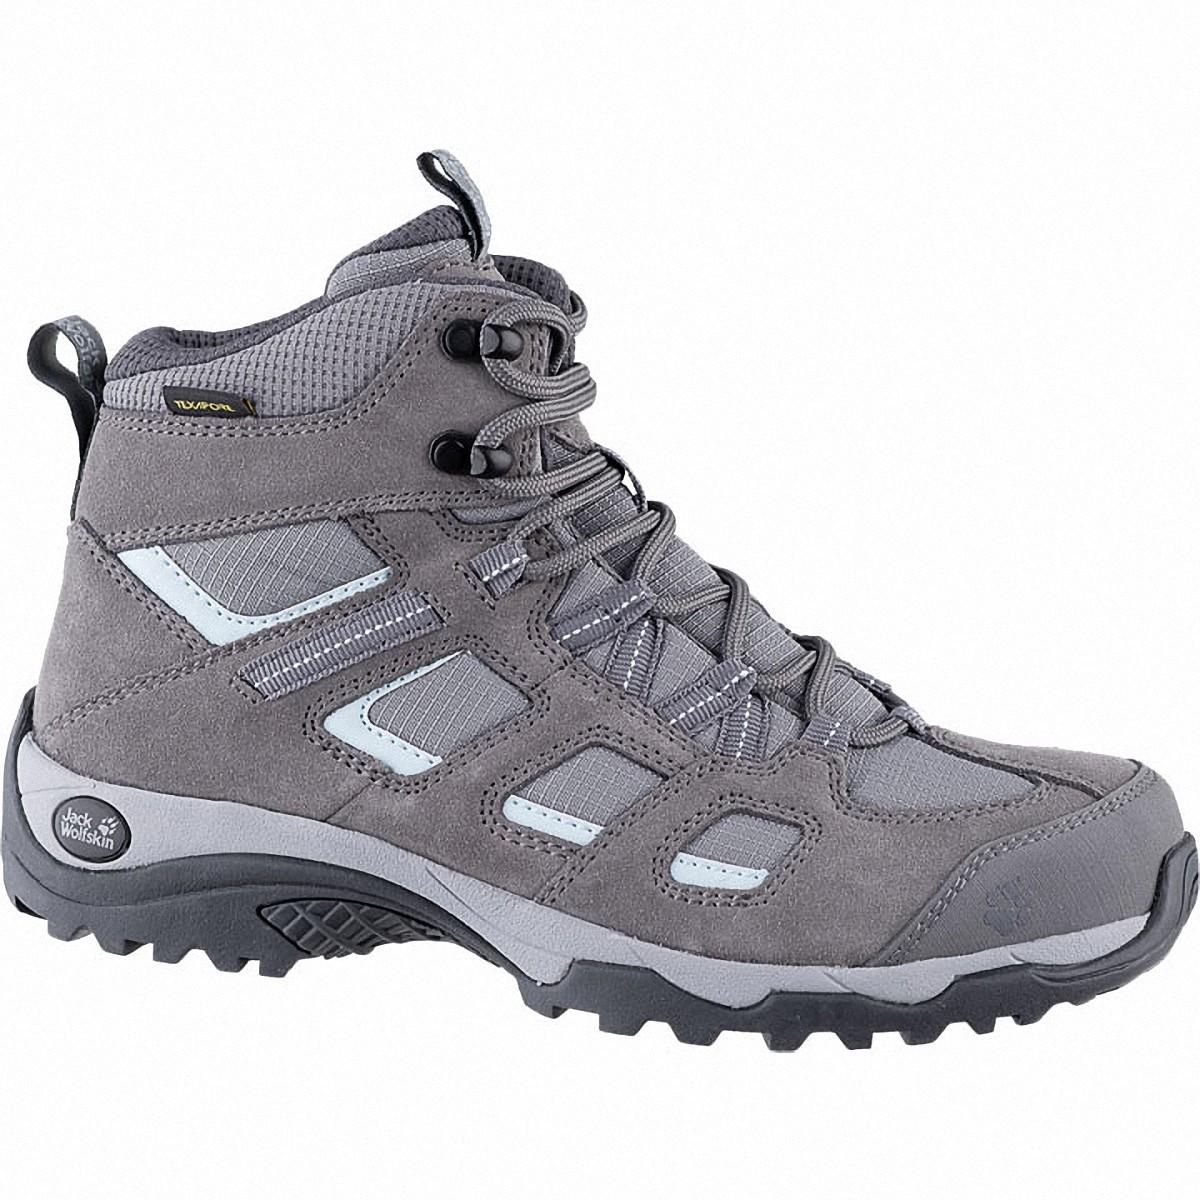 Jack Wolfskin Vojo Hike 2 Texapore Mid Women Damen Leder Outdoor Schuhe tarma